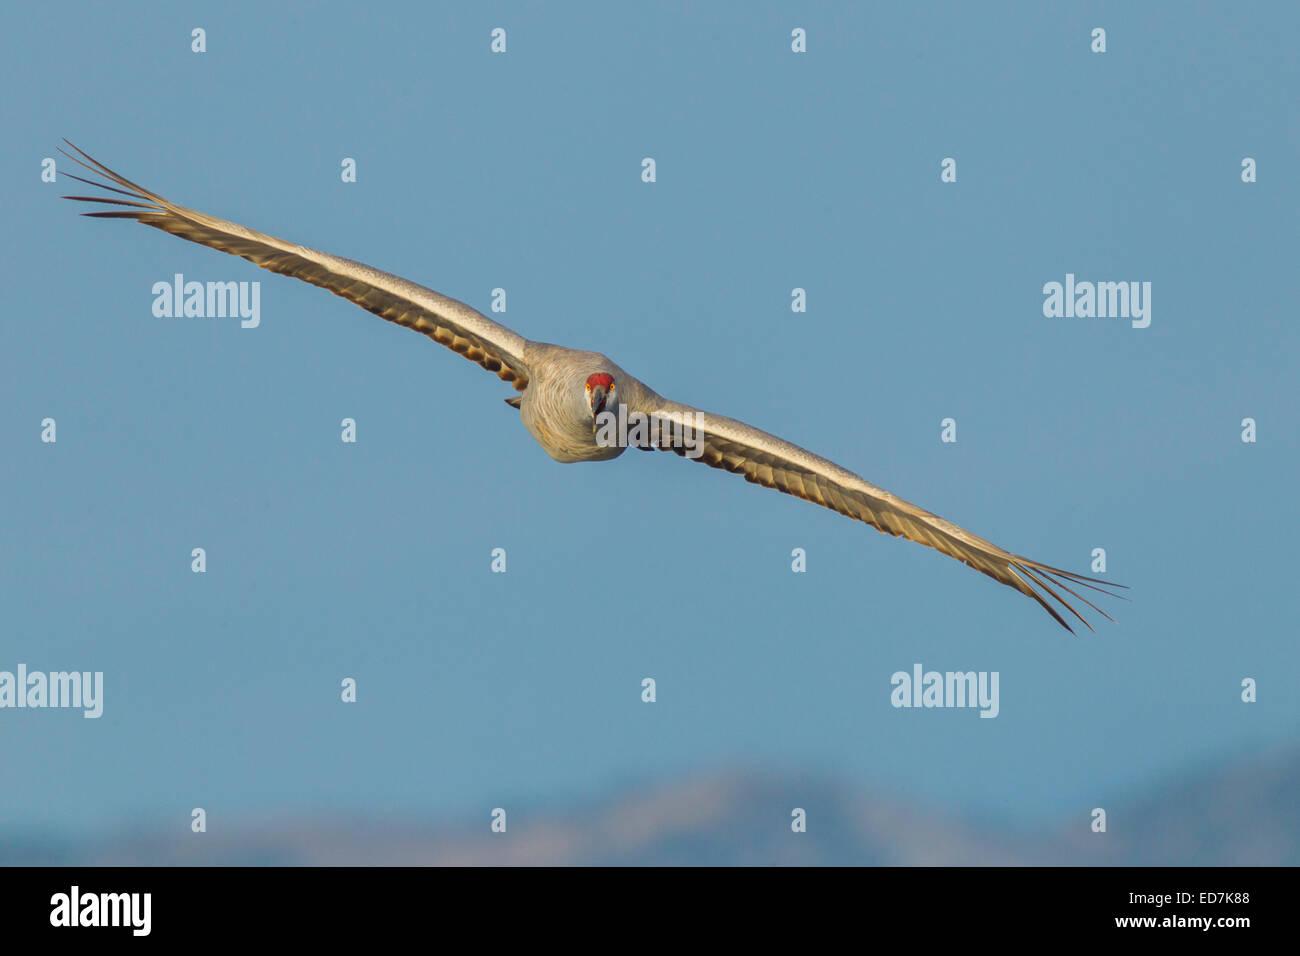 Sandhill Crane  Grus canadensis tabida  Bosque del Apache National Wildlife Refuge, New Mexico, United States 16 - Stock Image